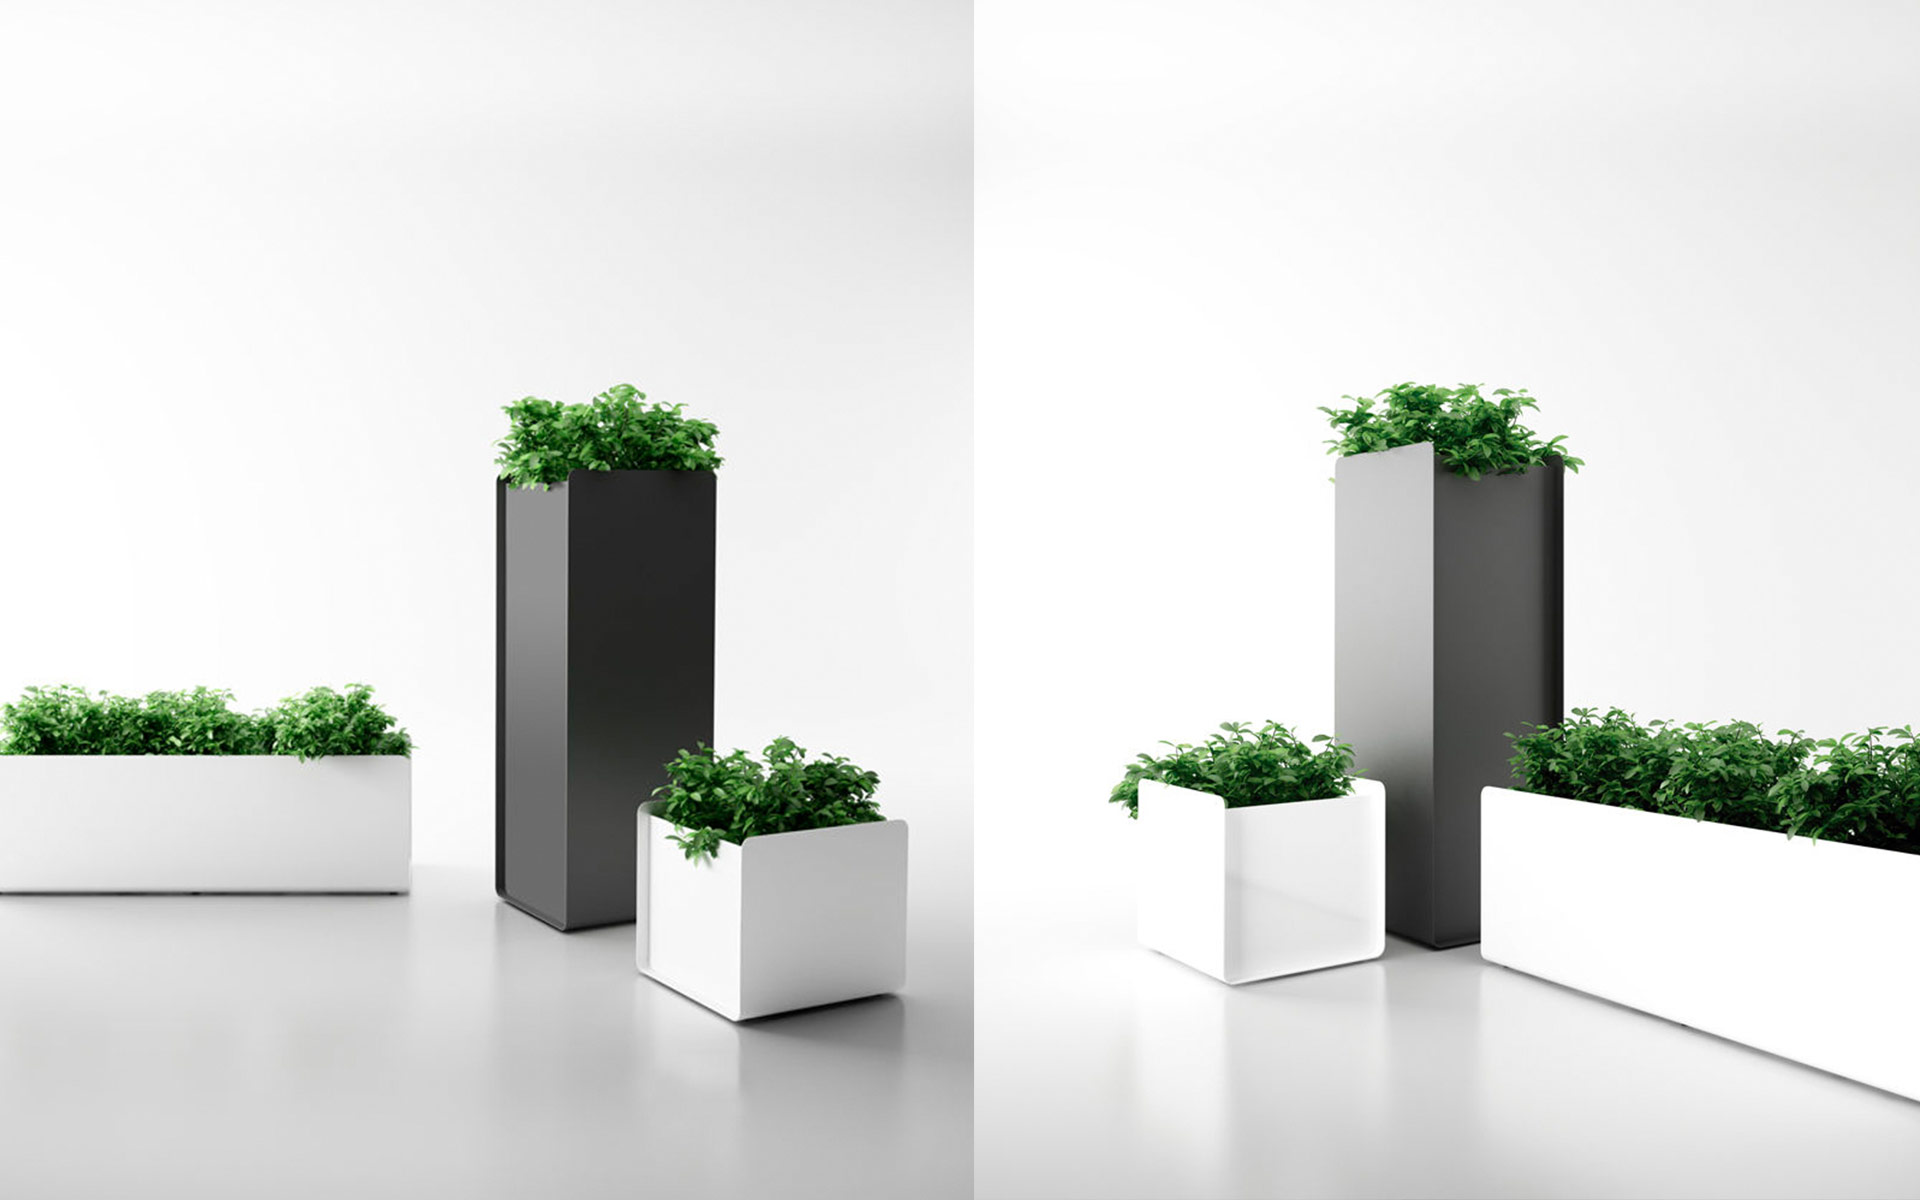 floral arrangement for vases trend and tuesday planters pedestal room alert planter